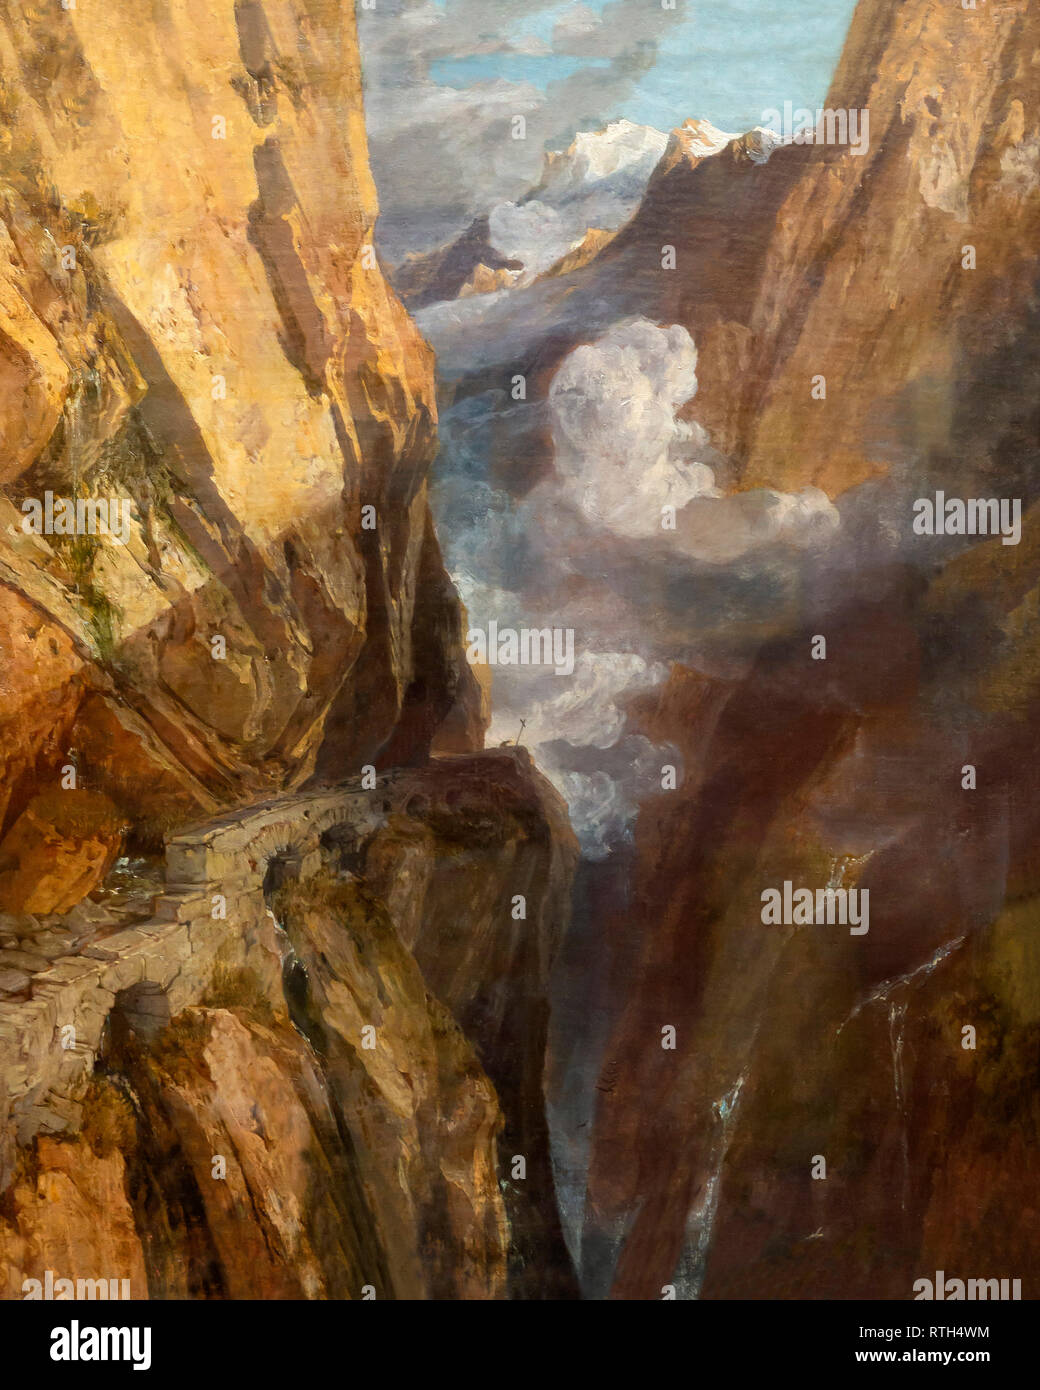 Den Pass von St. Gotthard, Schweiz, JMW Turner, ca. 1803-1804, Stockbild